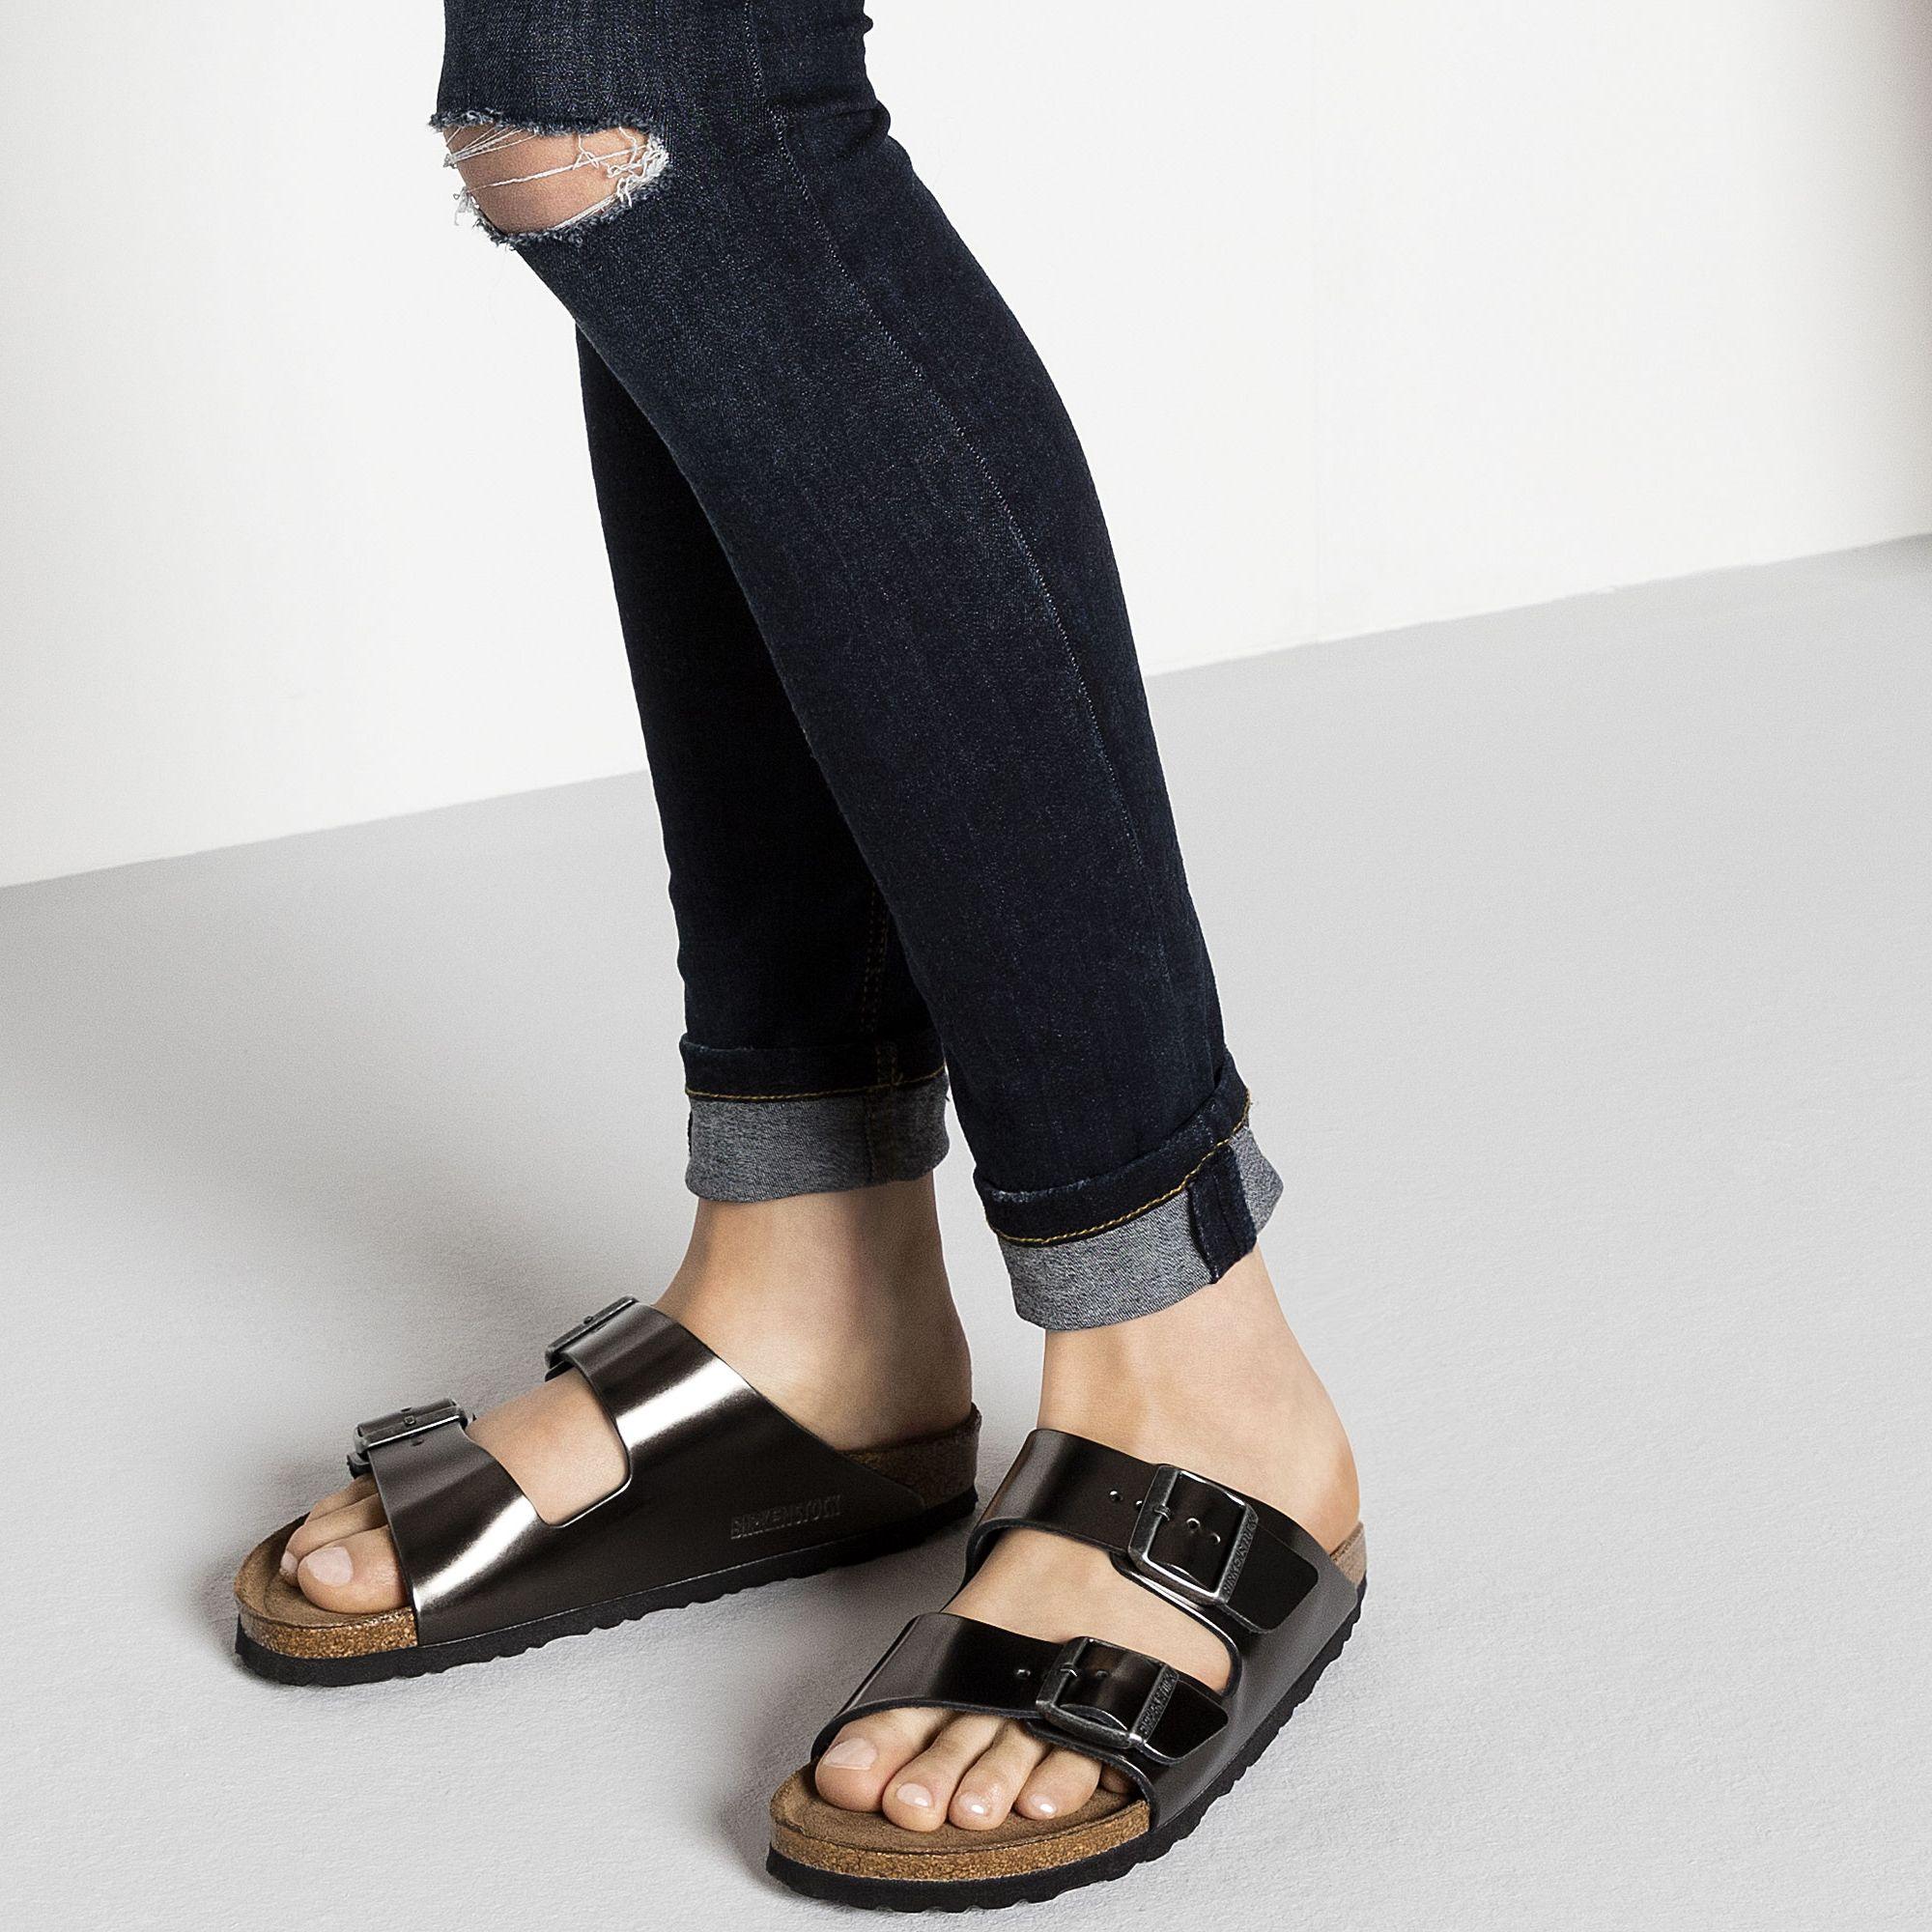 761590c0d8de Arizona Soft Footbed Leather Metallic Anthracite